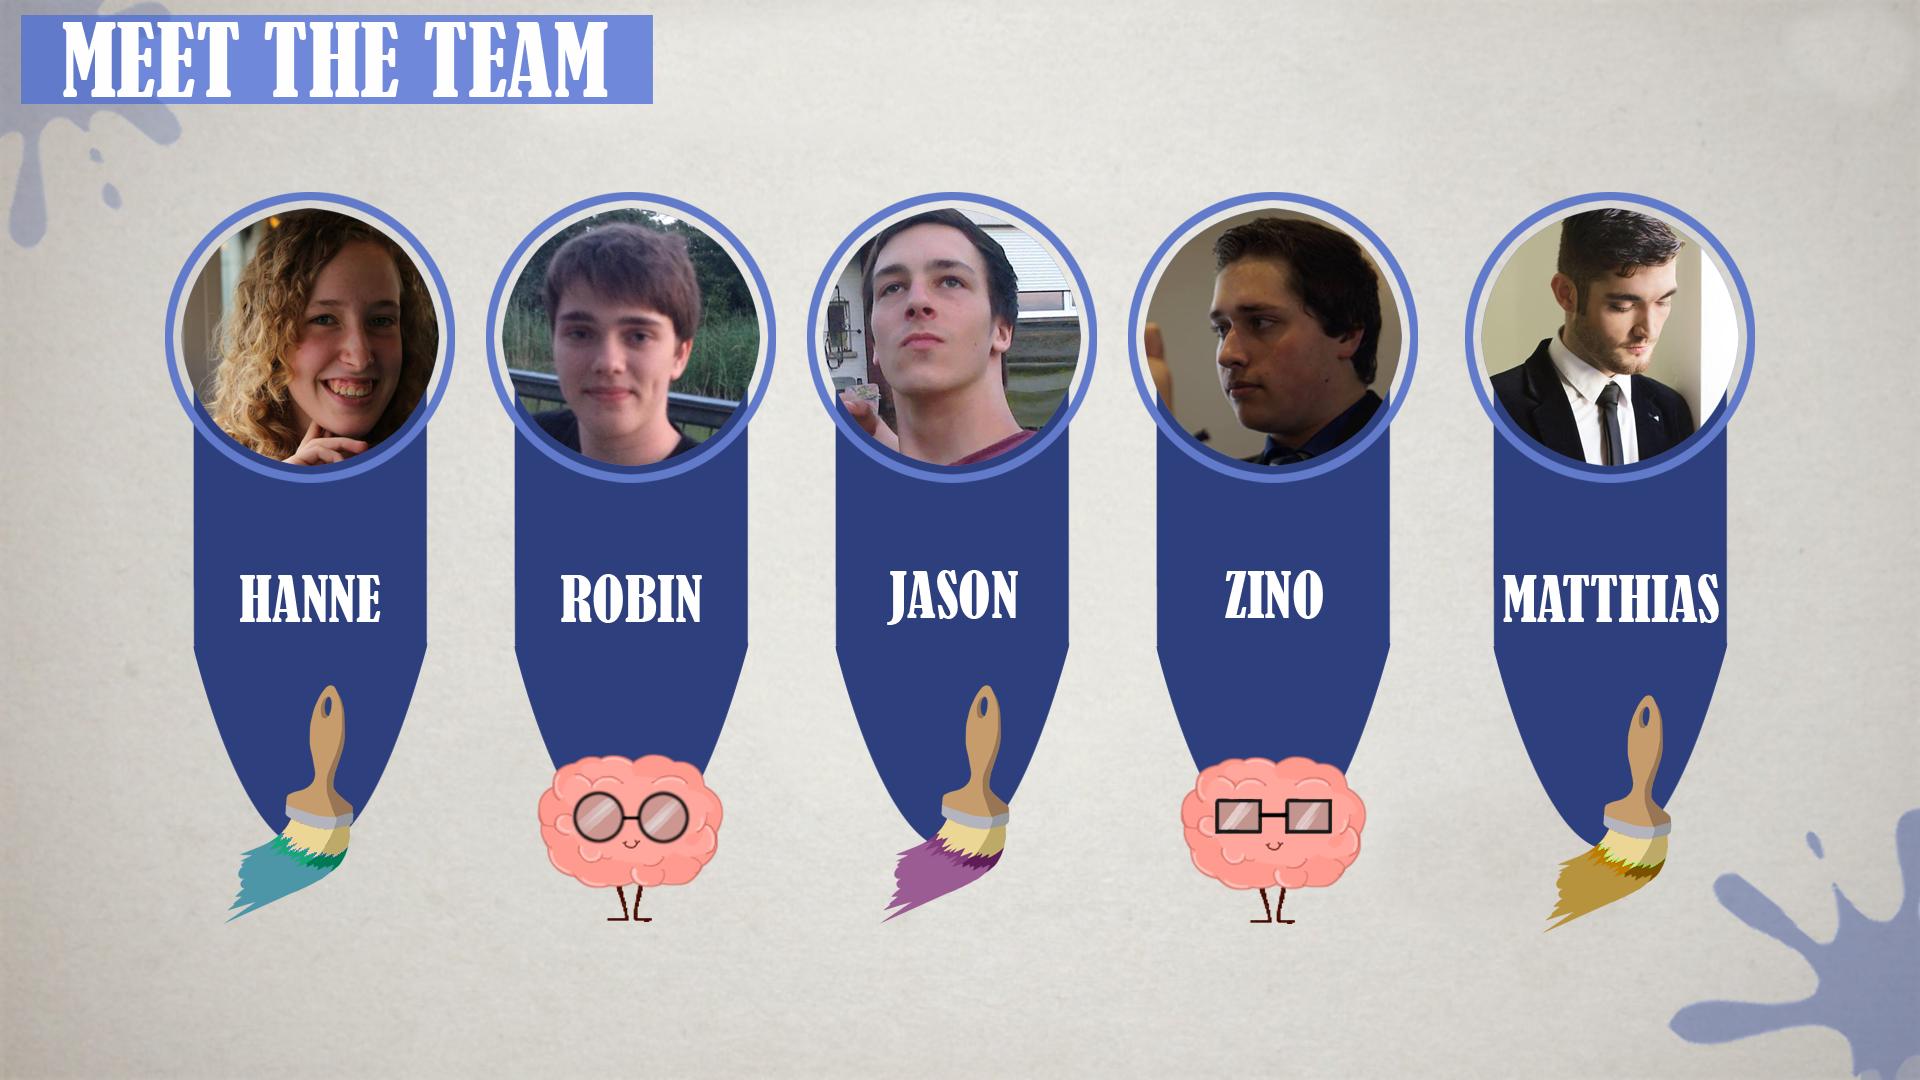 002_Team